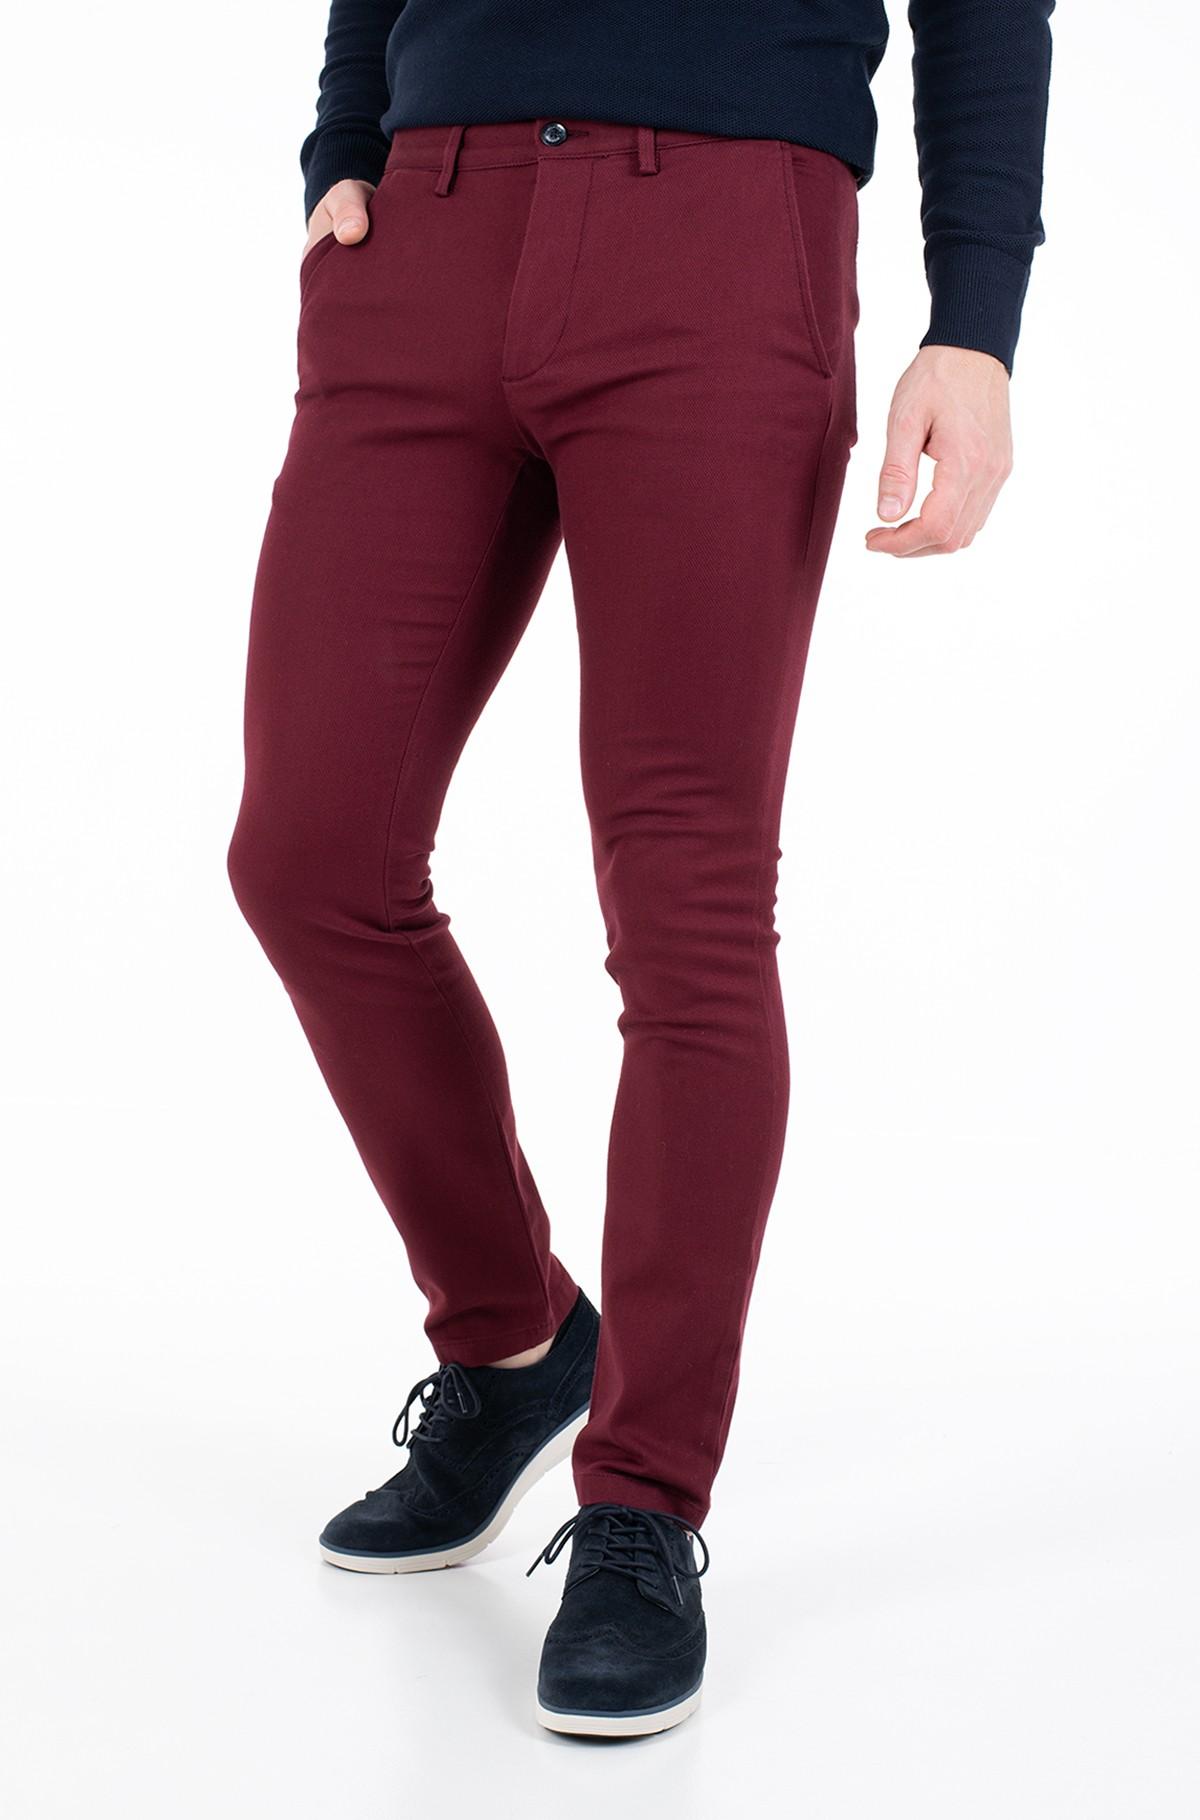 Kelnės su kantu BLEECKER FINE PD STRUCTURE-full-1